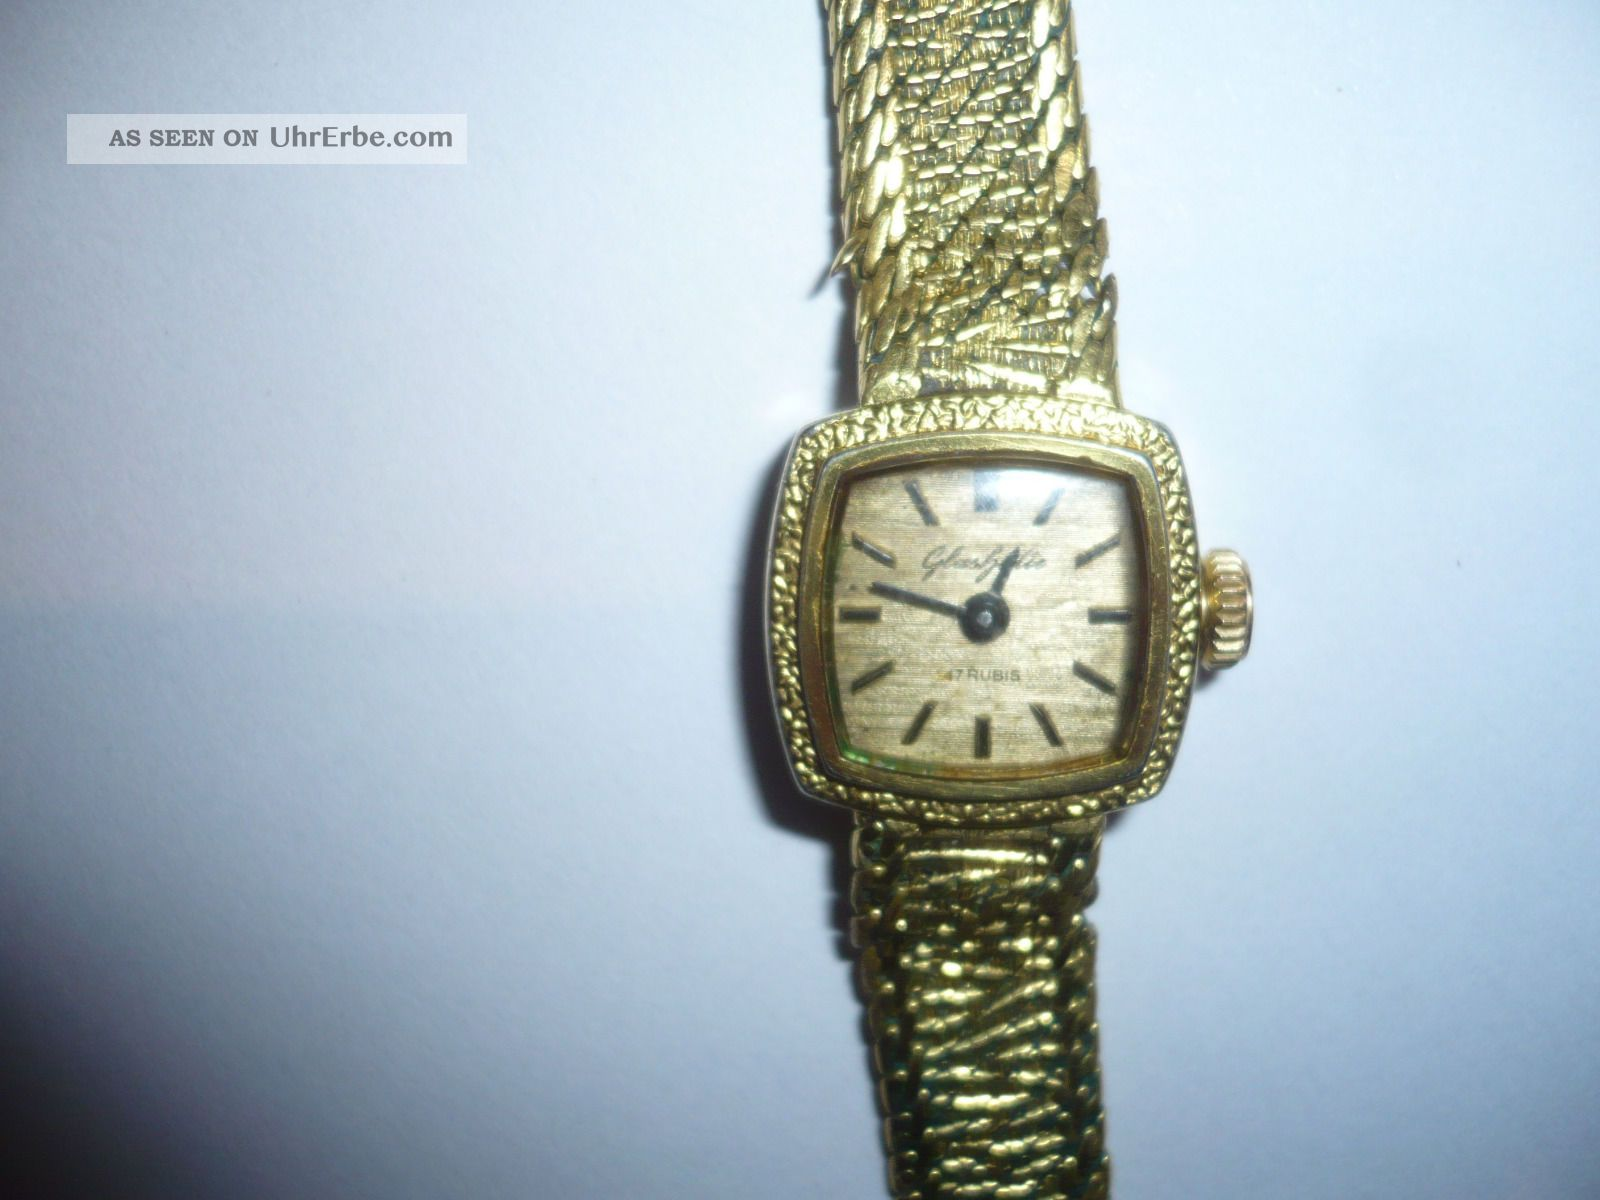 Gub Damen Armband Uhr Glashütte Handaufzug 17 Rubis In Goldoptik Armbanduhren Bild